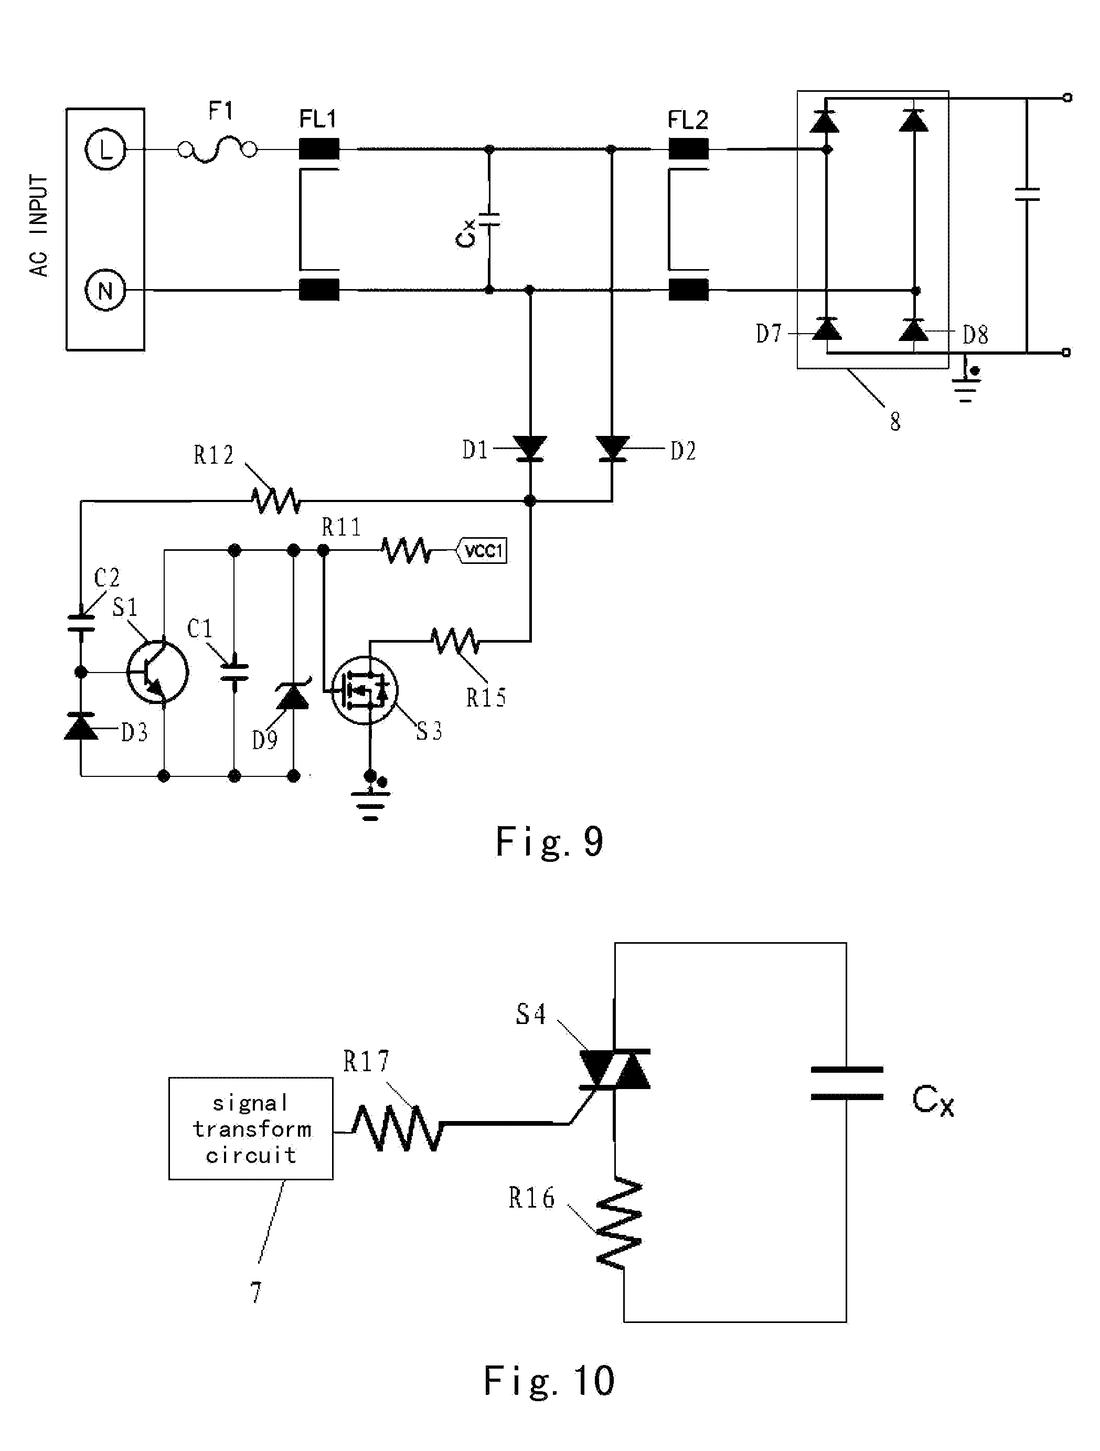 Wiring diagram jerrysmasterkeyforyouand me circuits drawing at getdrawings free for personal use circuits